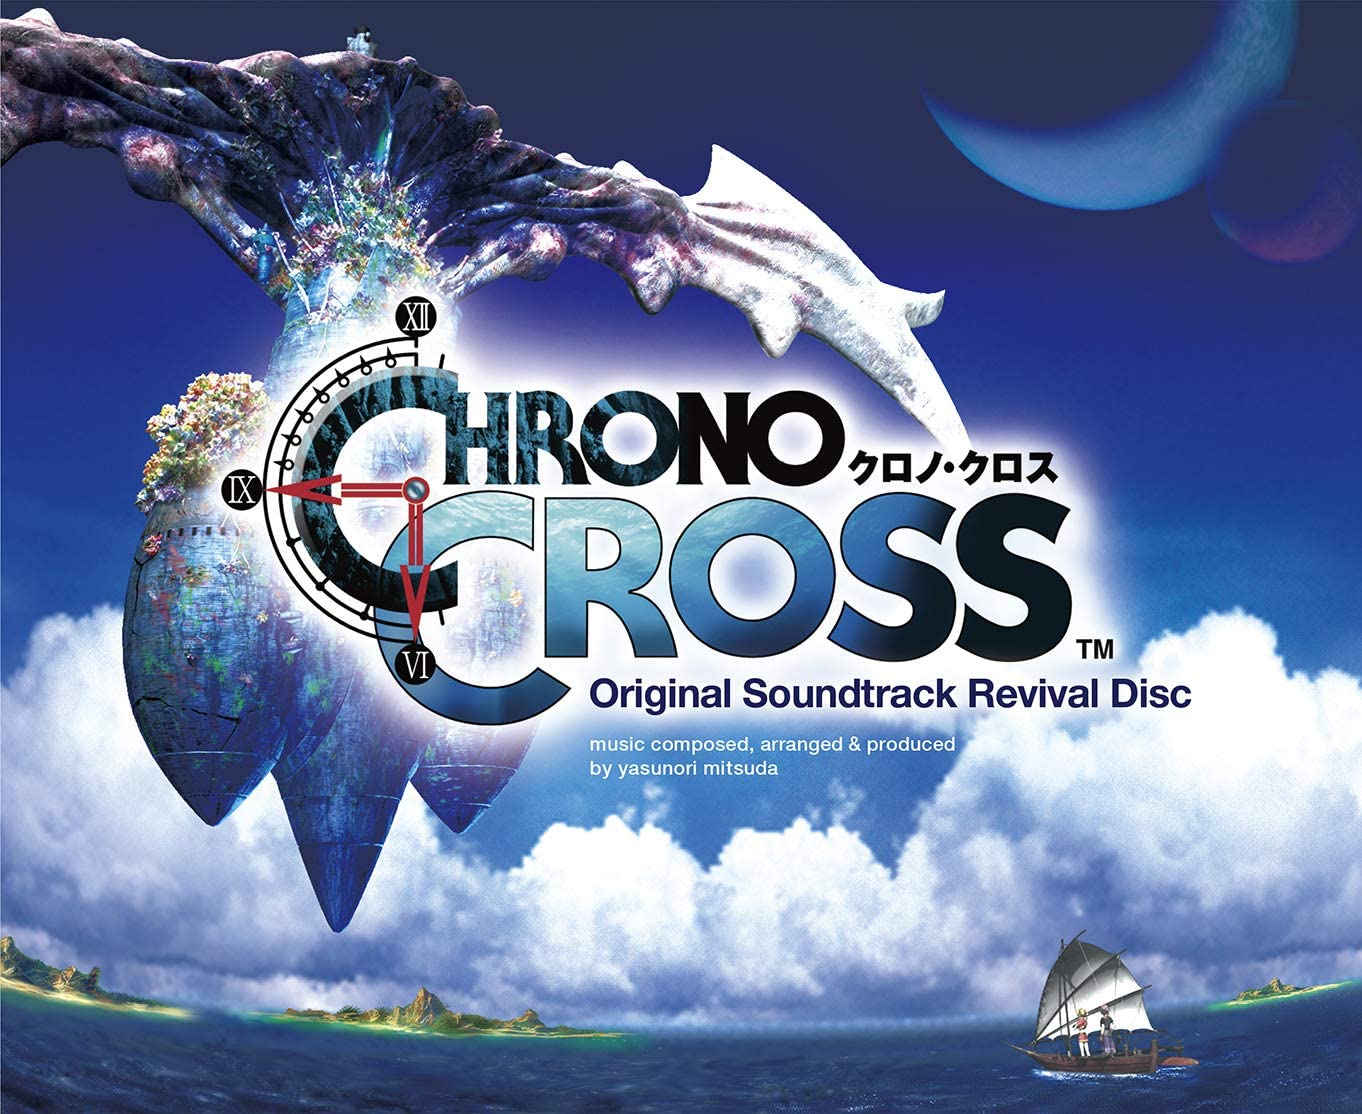 Amazon Chrono Cross Original Soundtrack Revival Disc 映像付サントラ Blu Ray Disc Music 通常盤 特典なし 光田 康典 アニメ 音楽